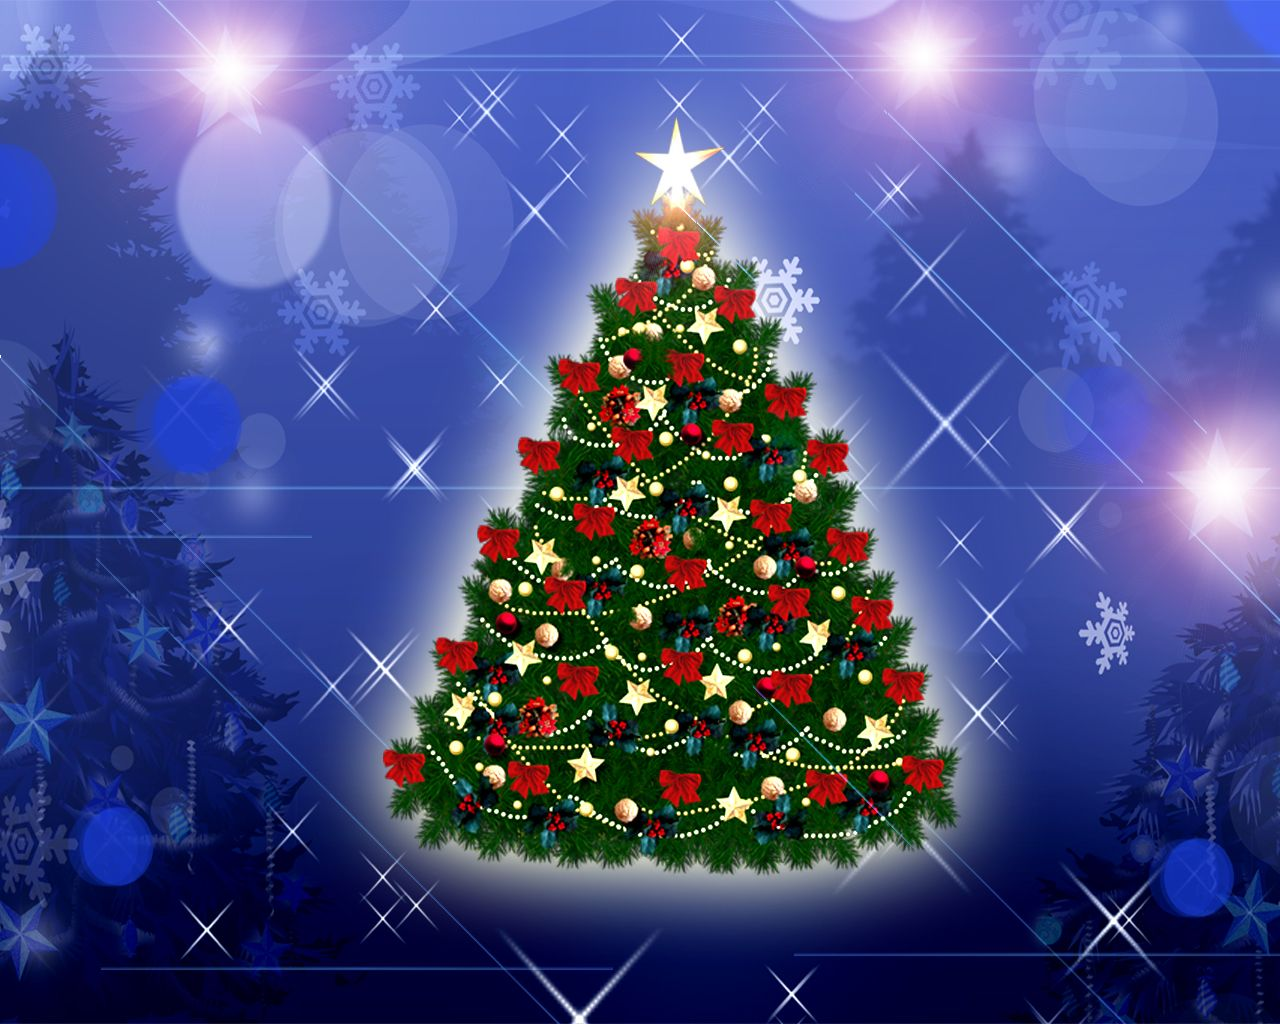 Pin On G S Christmas Ideas